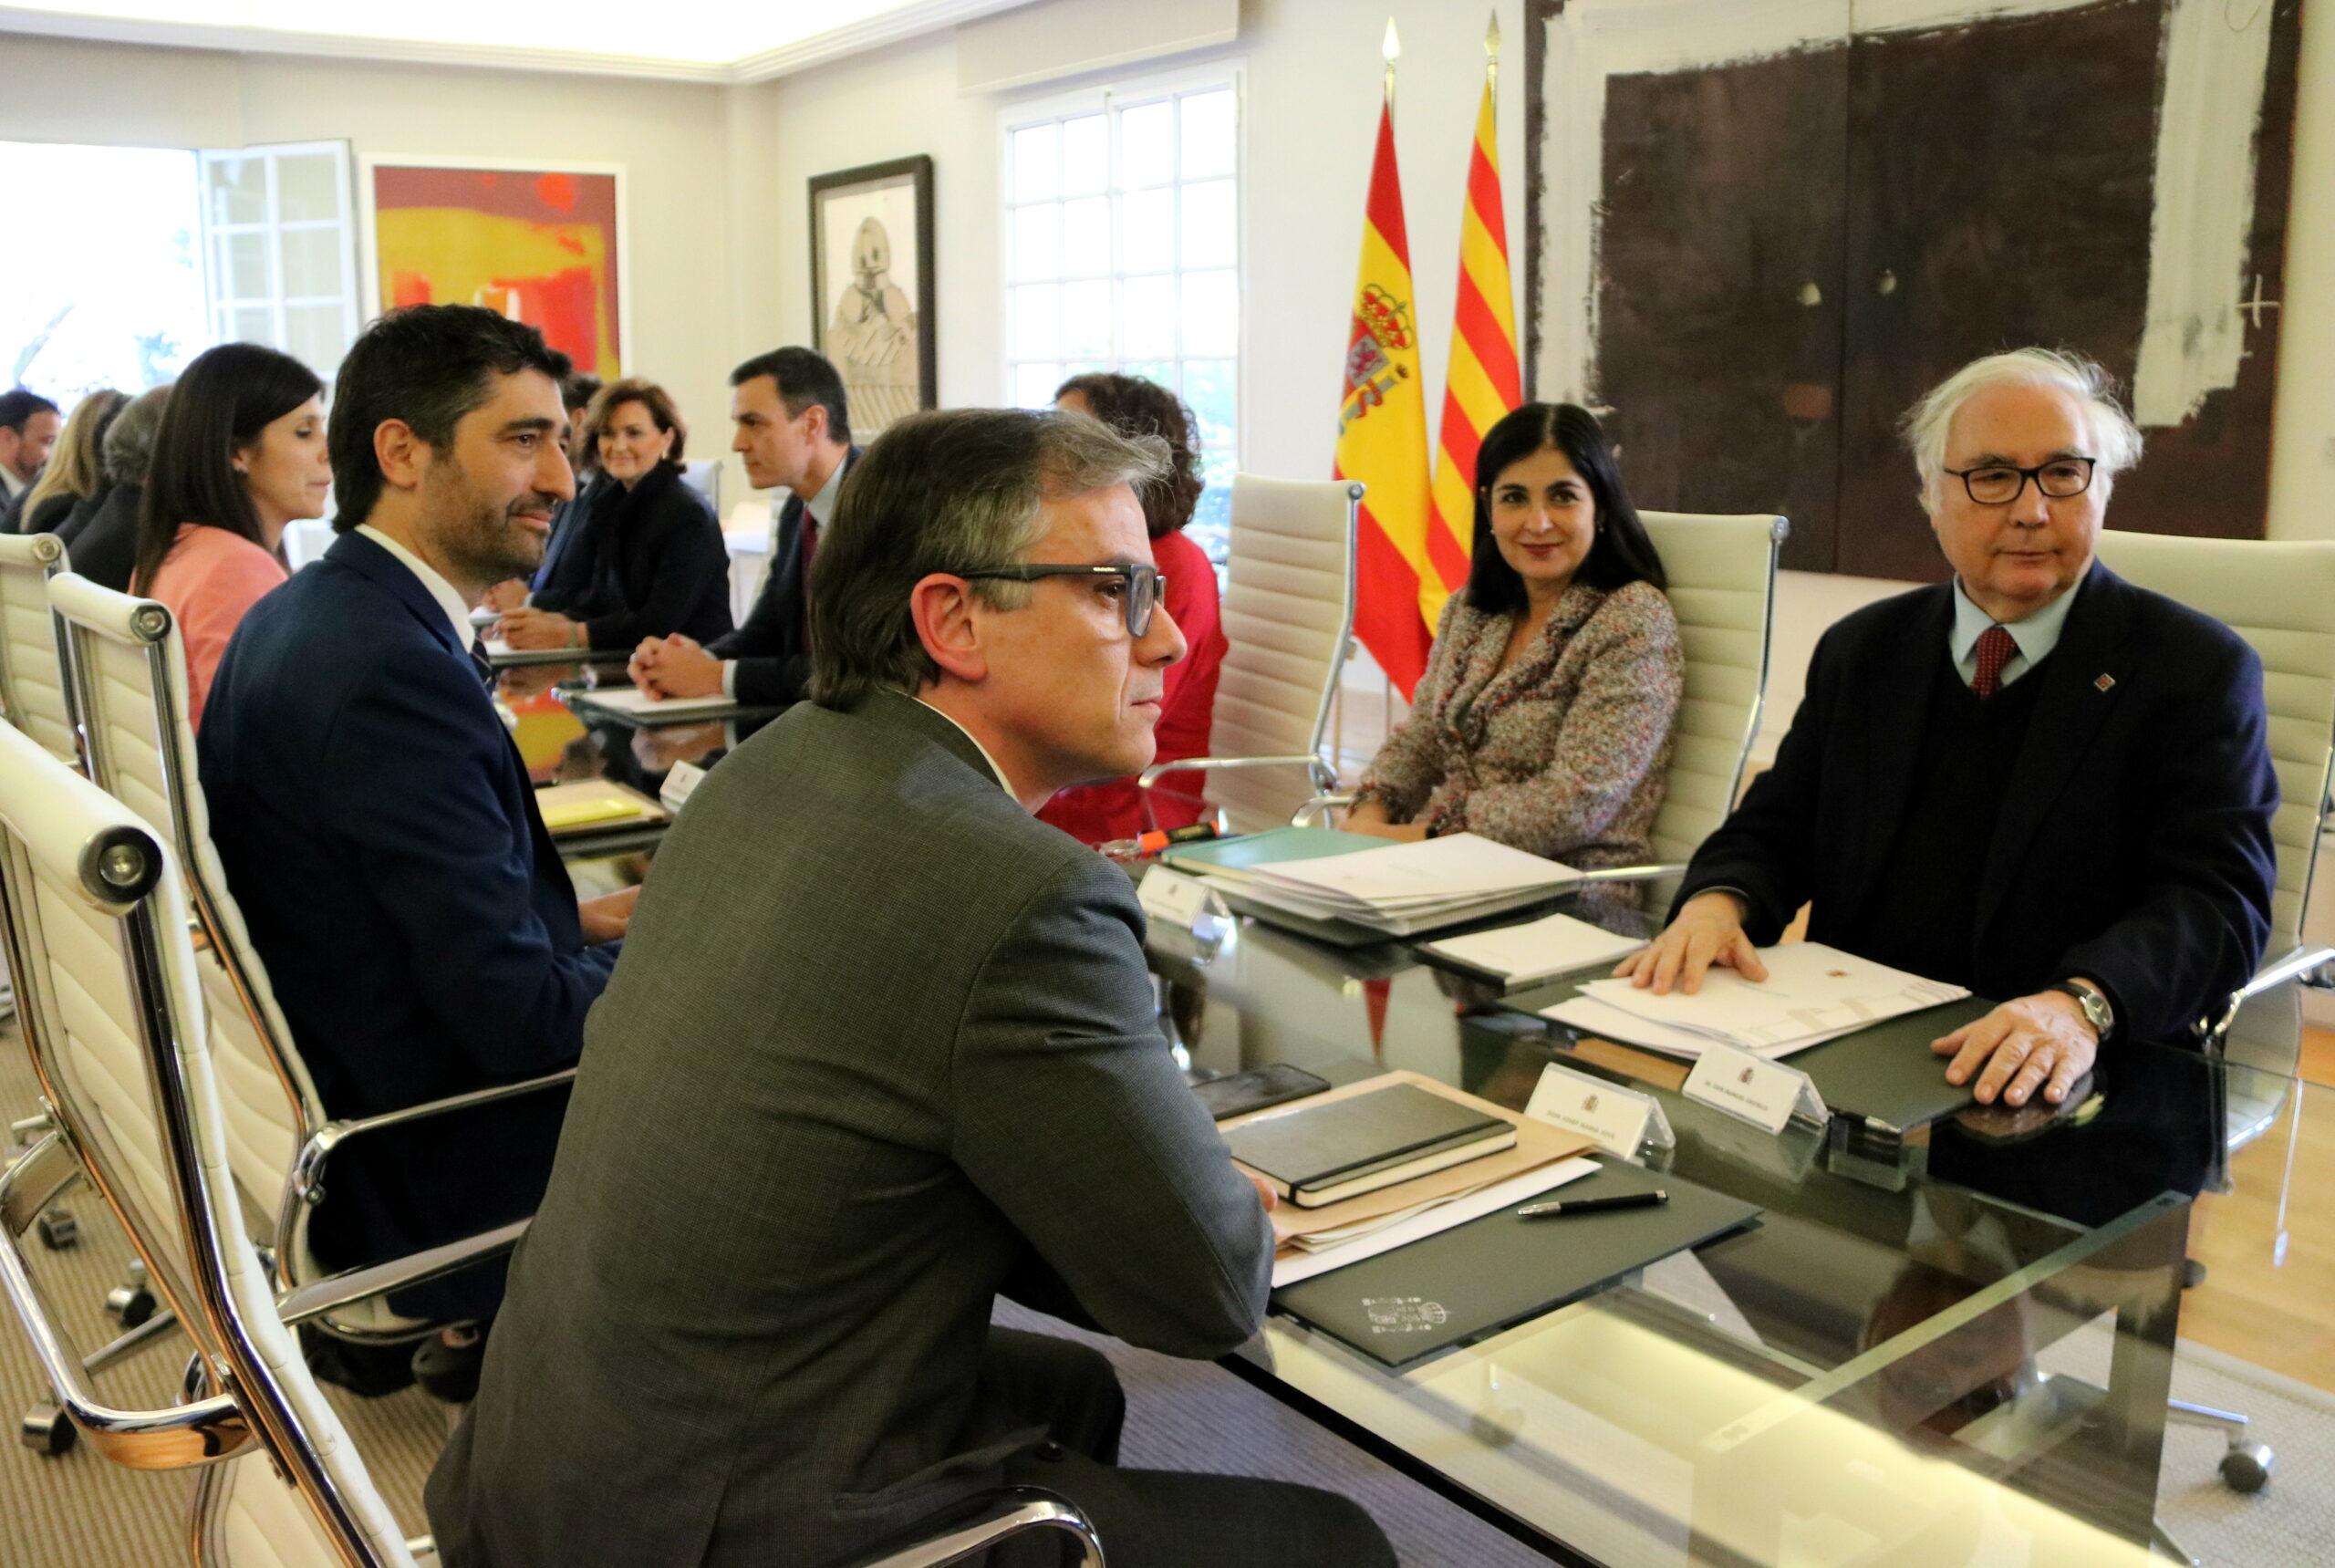 La taula de diàleg entre governs | ACN